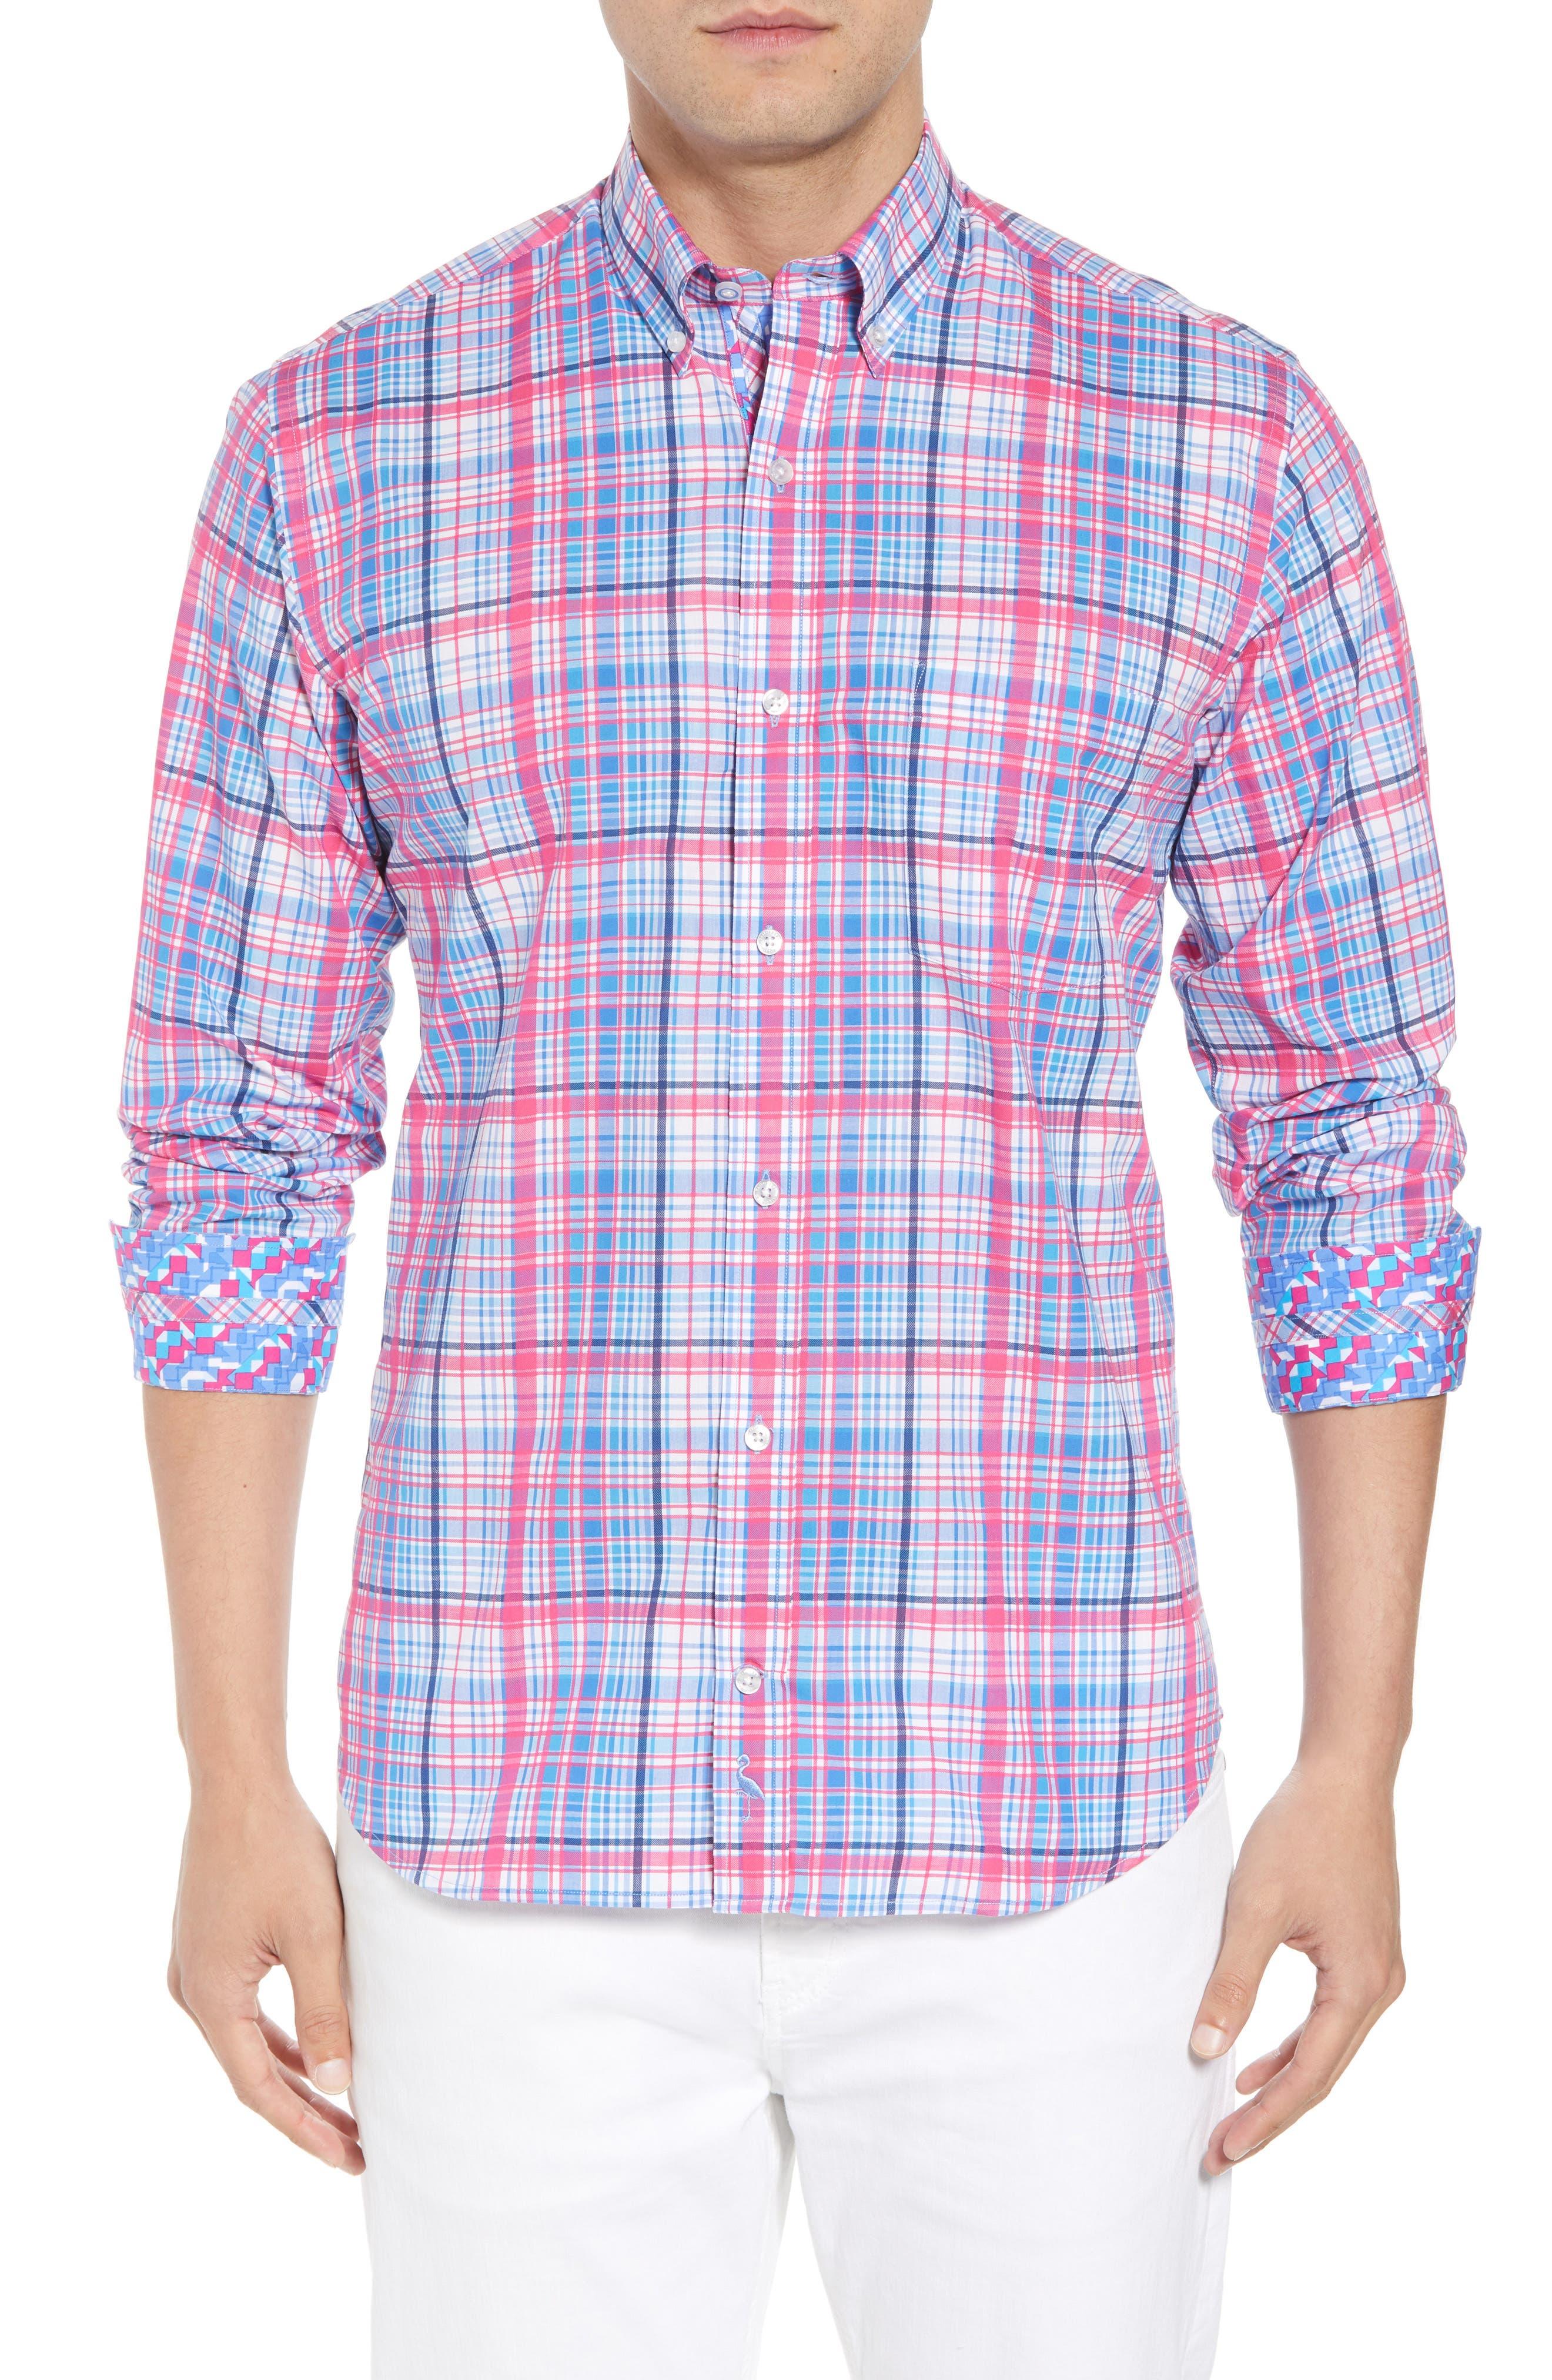 Beacon Regular Fit Plaid Sport Shirt,                         Main,                         color, 650